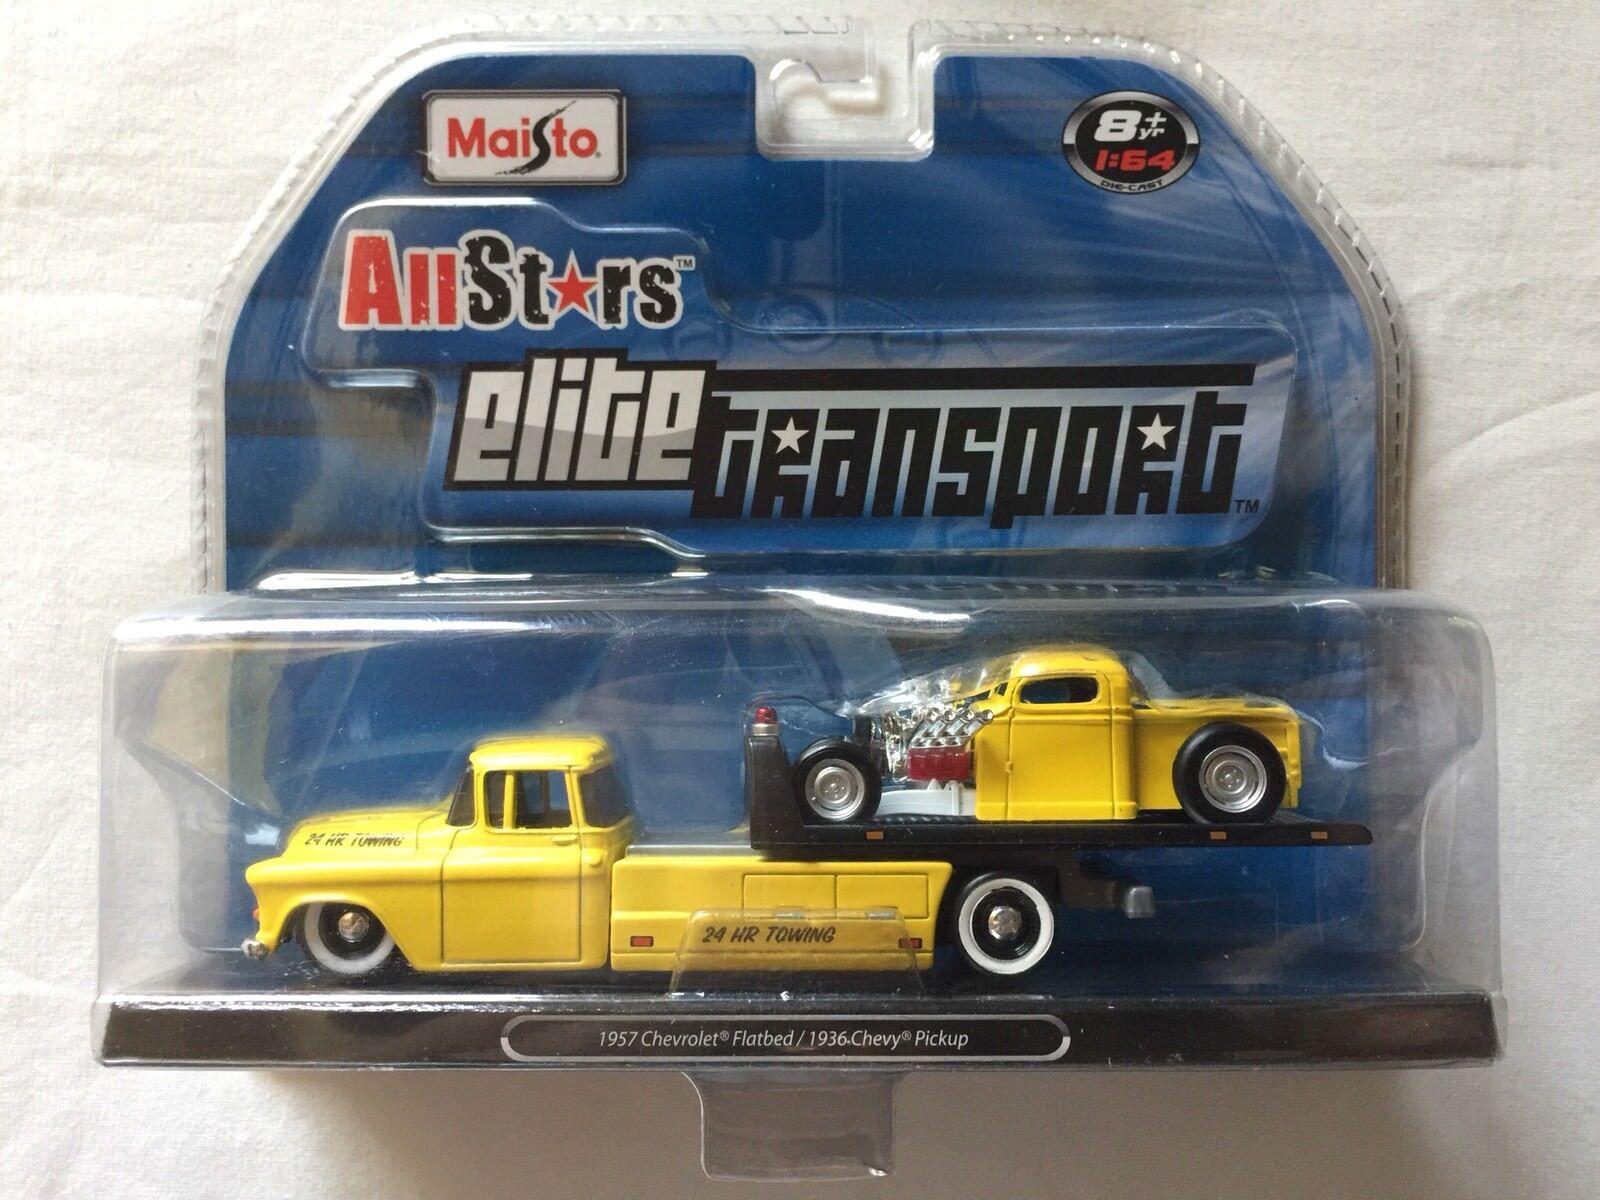 Maisto All Stars Elite transporte 1957 Chevrolet Plano 1936 Chevy Pickup giallo